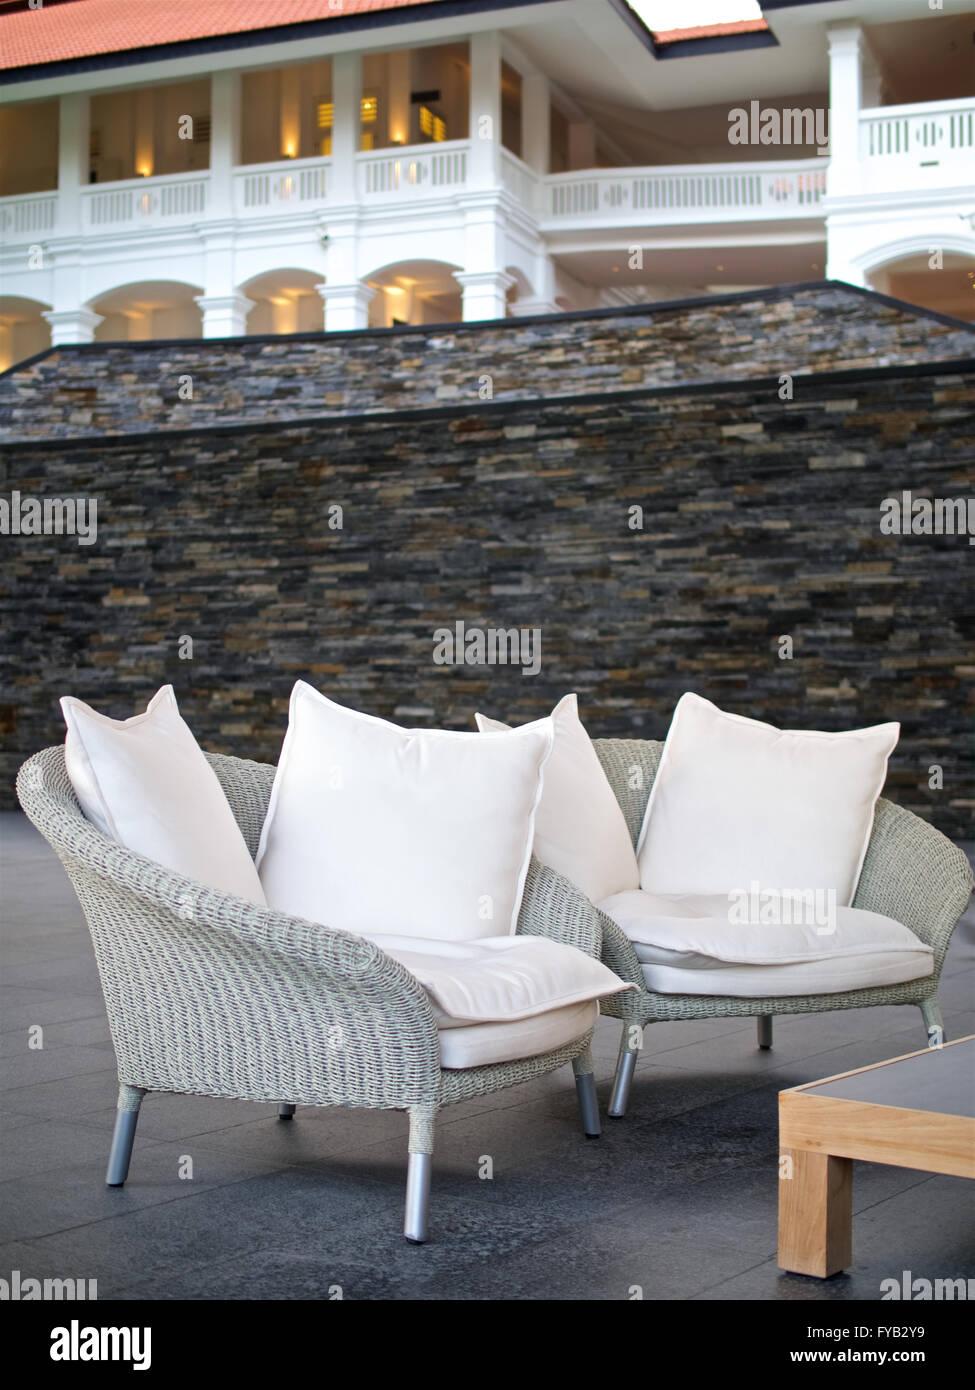 Janus Et Cie Outdoor Furniture Sofa Chair